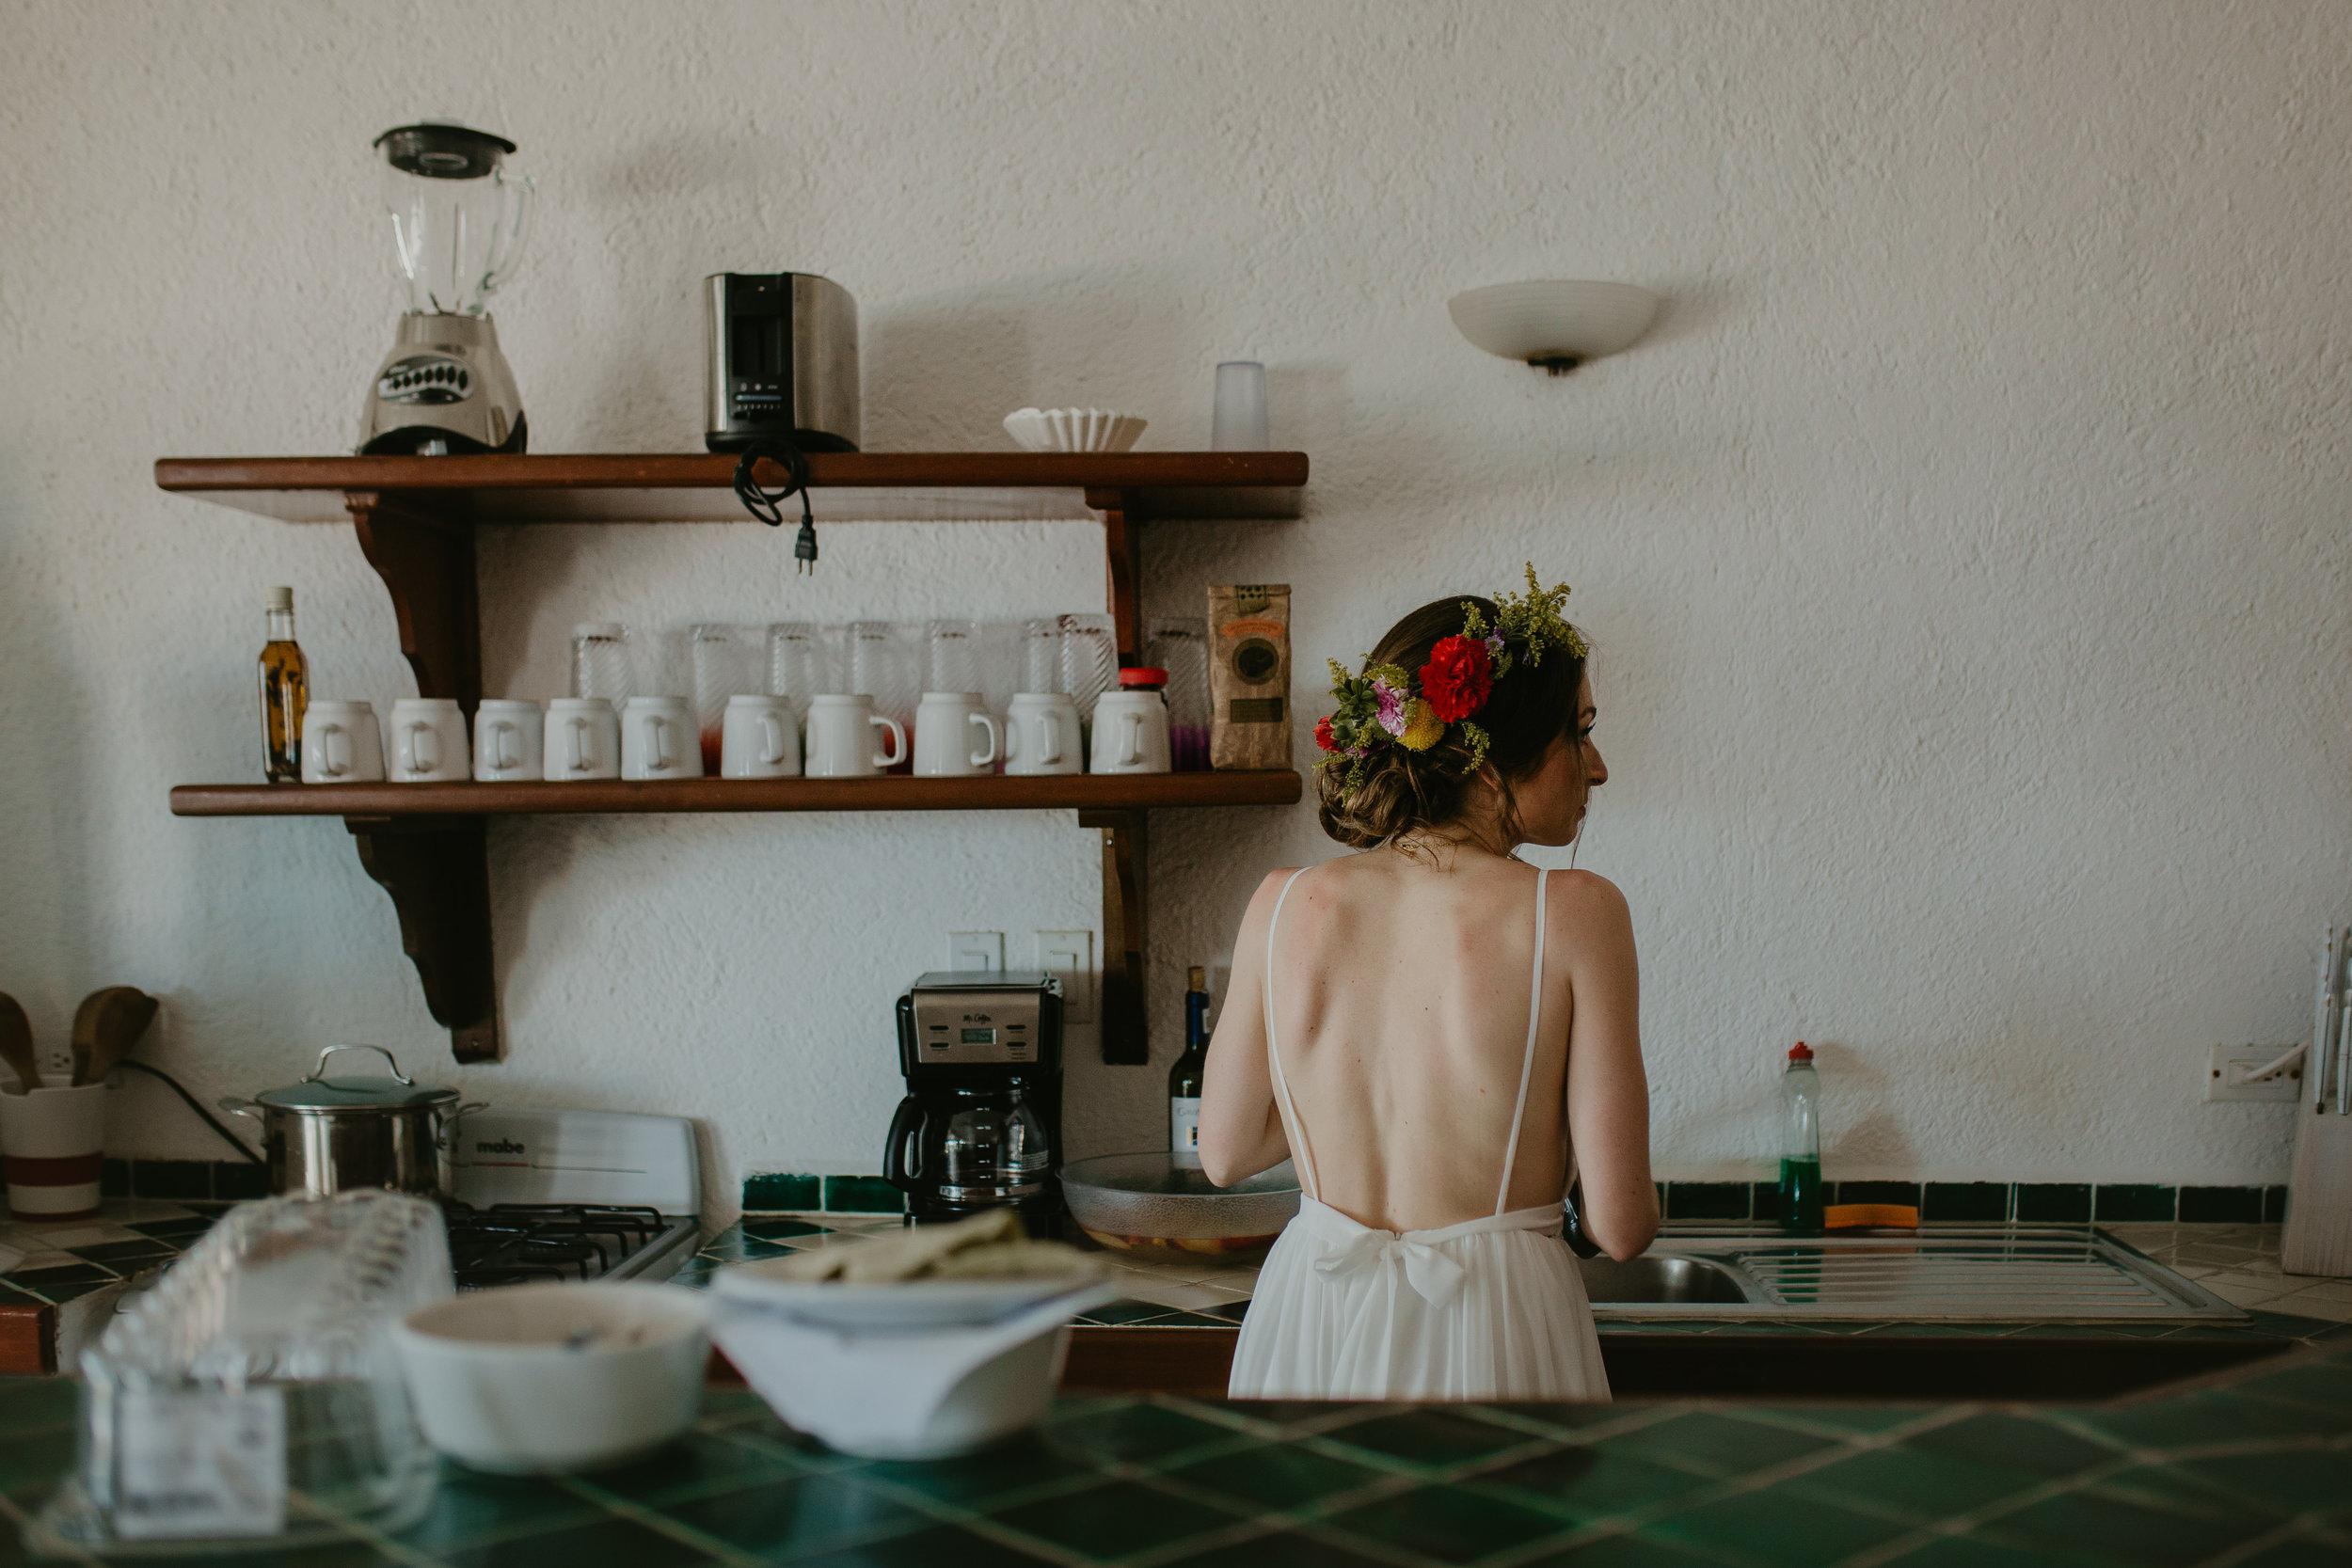 Nicole-Daacke-Photography-beachfront-akumal-destionation-wedding-tulum-mexico-elopement-photographer-destination-wedding-inspiration-sunset-champagne-pop-boho-bride-ocean-tropical-bohemian-tulum-wedding-photos-106.jpg